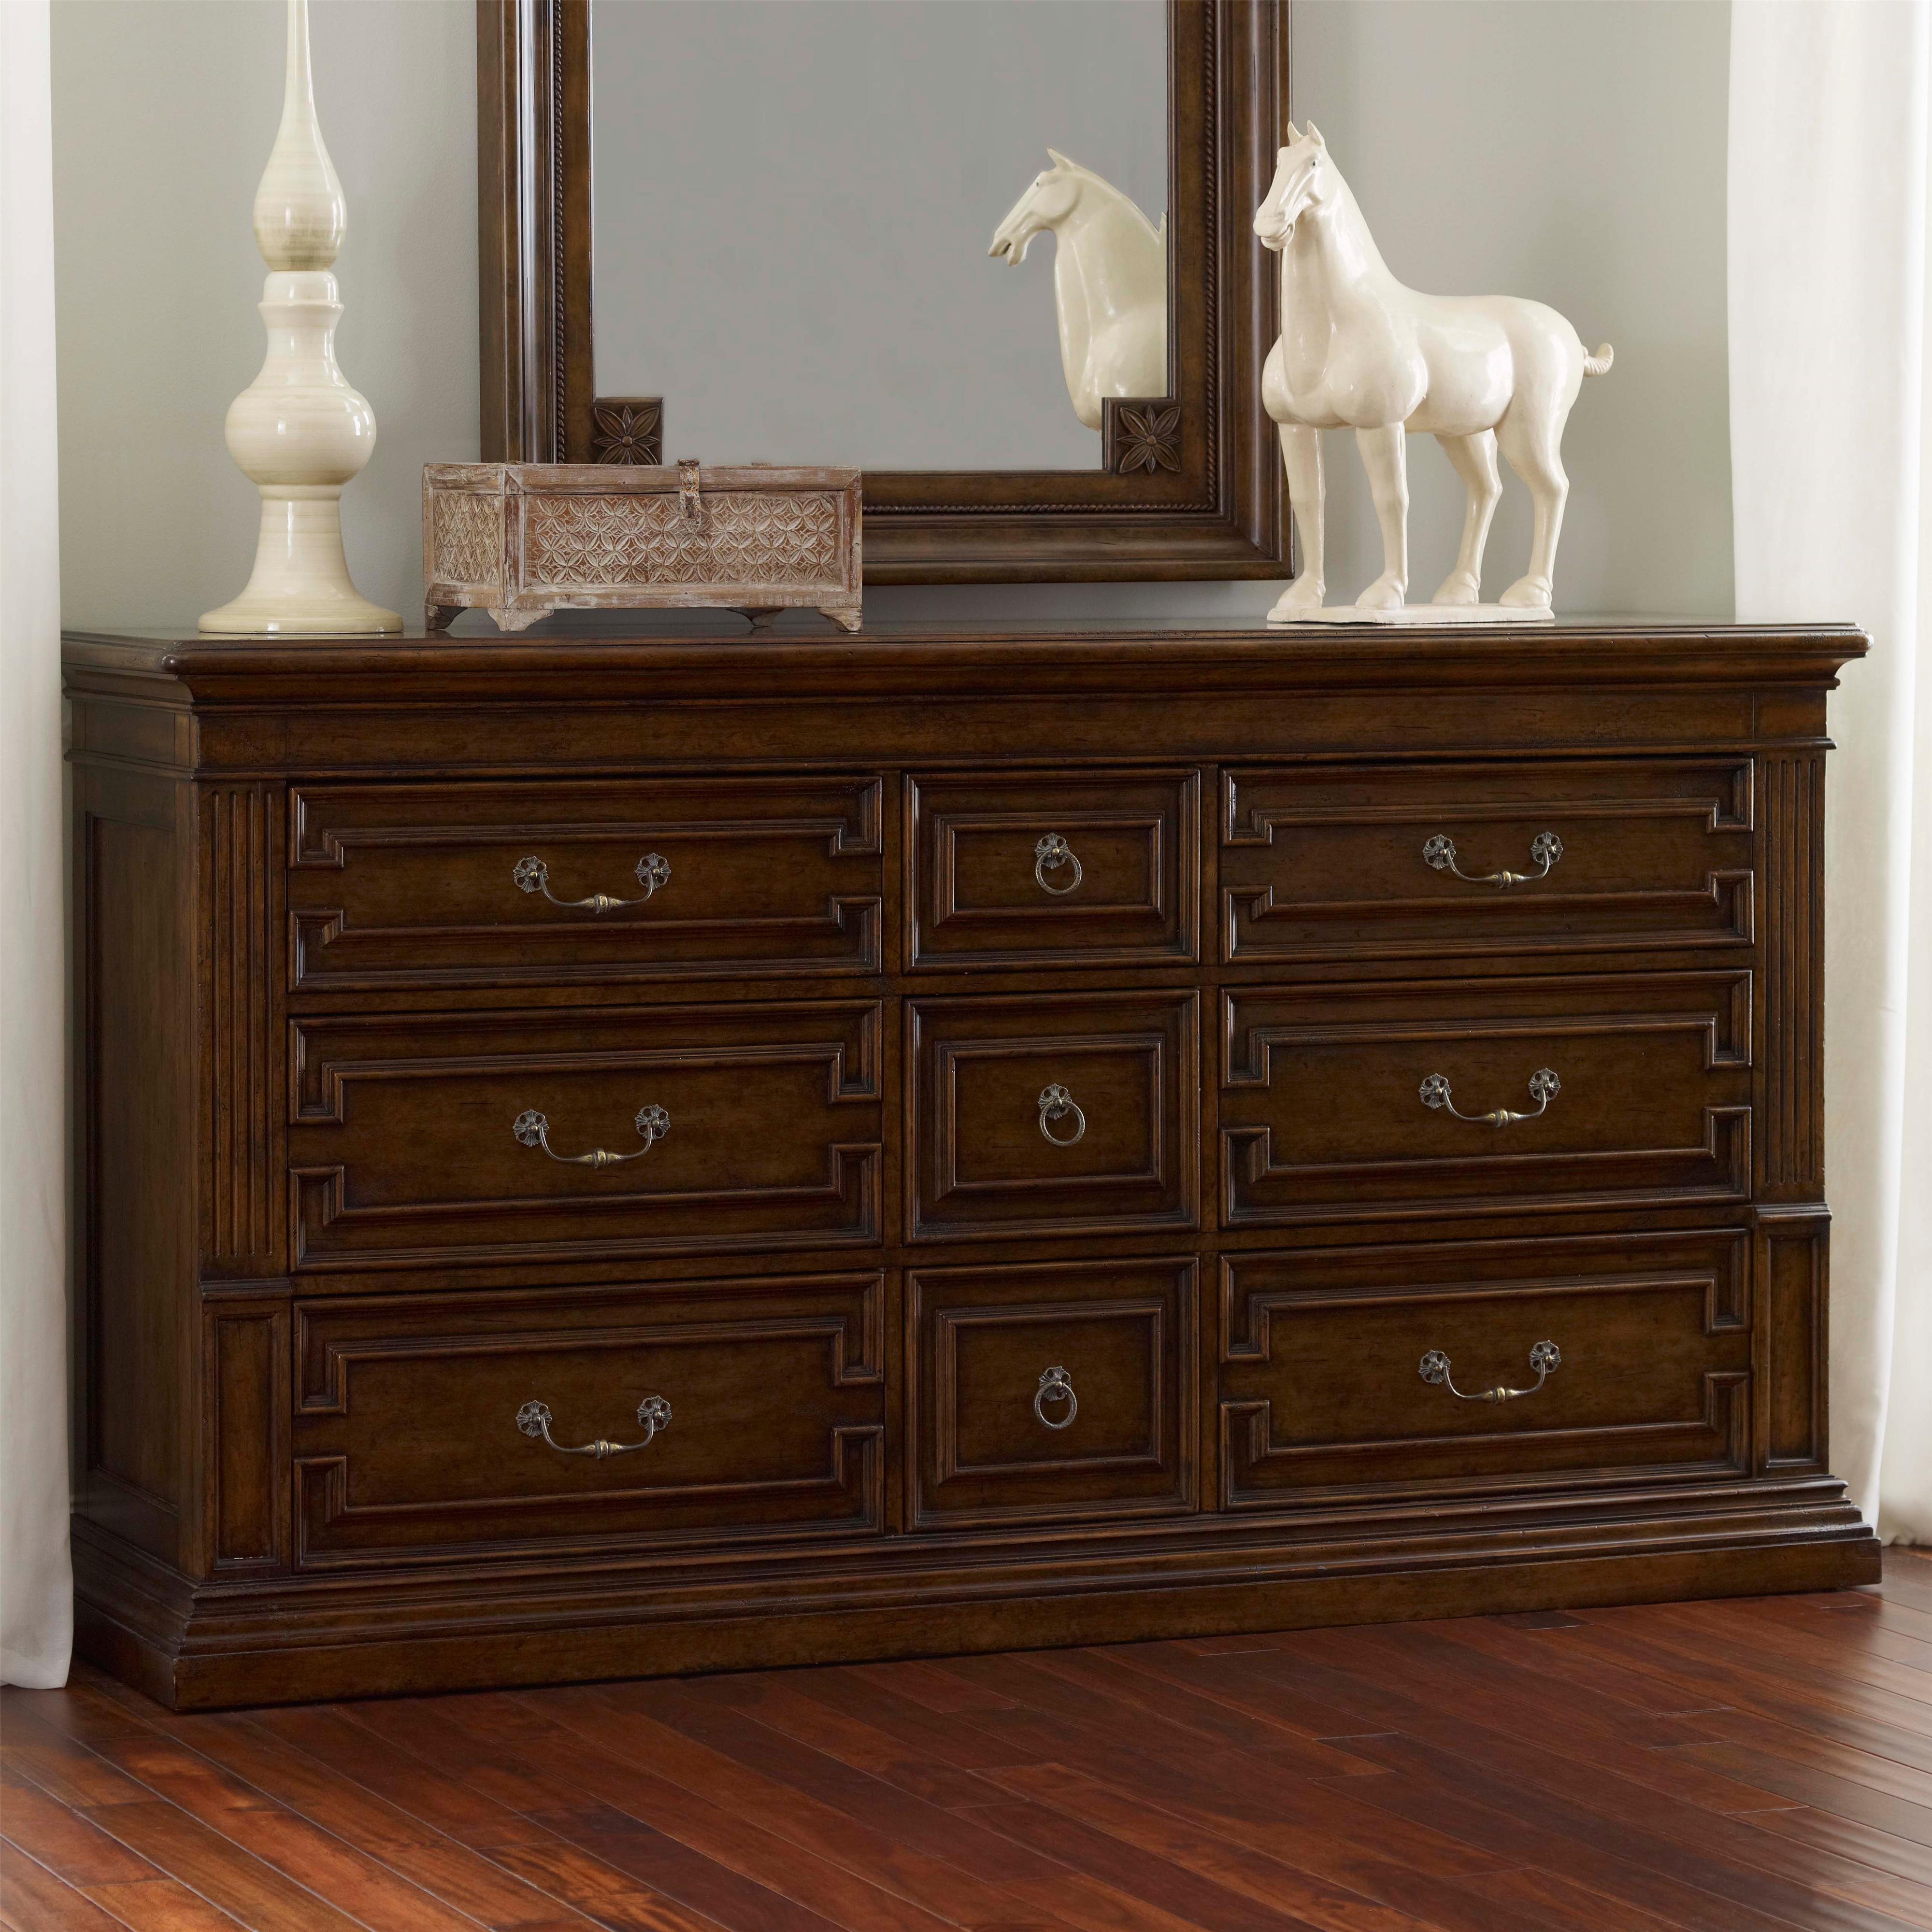 Belfort Signature Belle Haven Jefferson Dresser - Item Number: 217133-2610